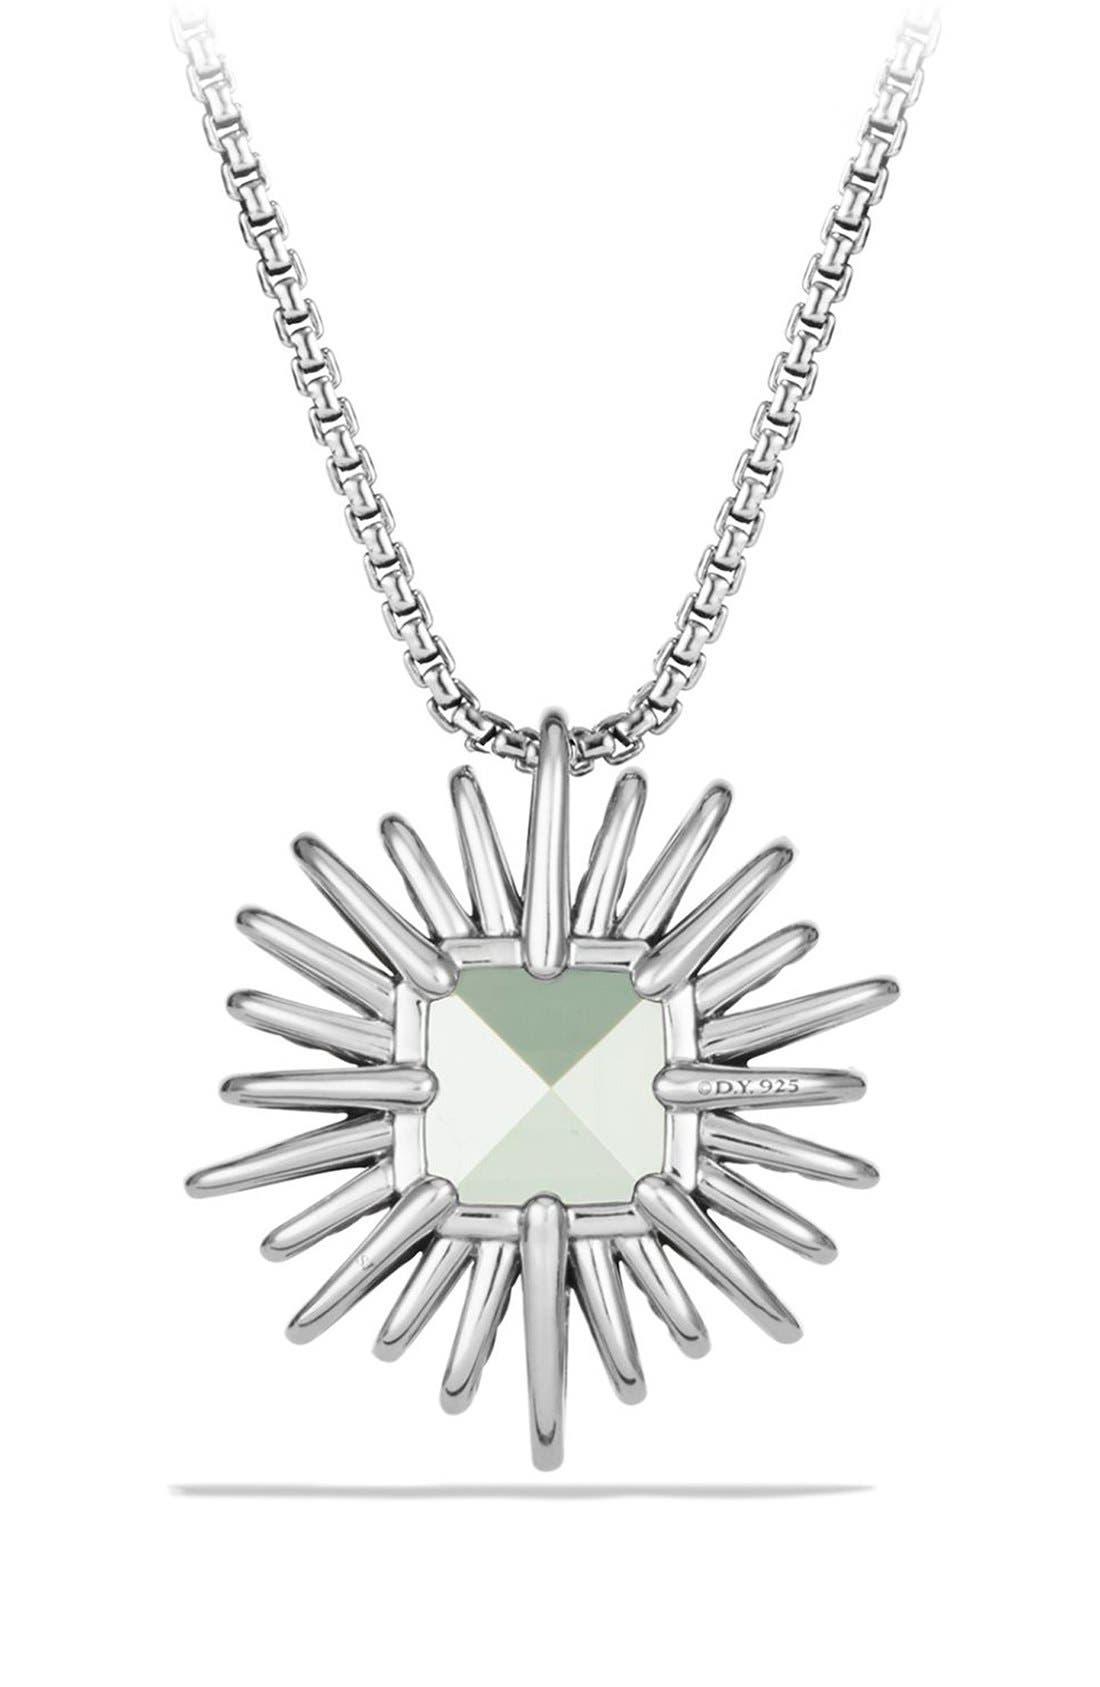 'Starburst' Necklace with Diamonds in Silver,                             Alternate thumbnail 3, color,                             PRASIOLITE